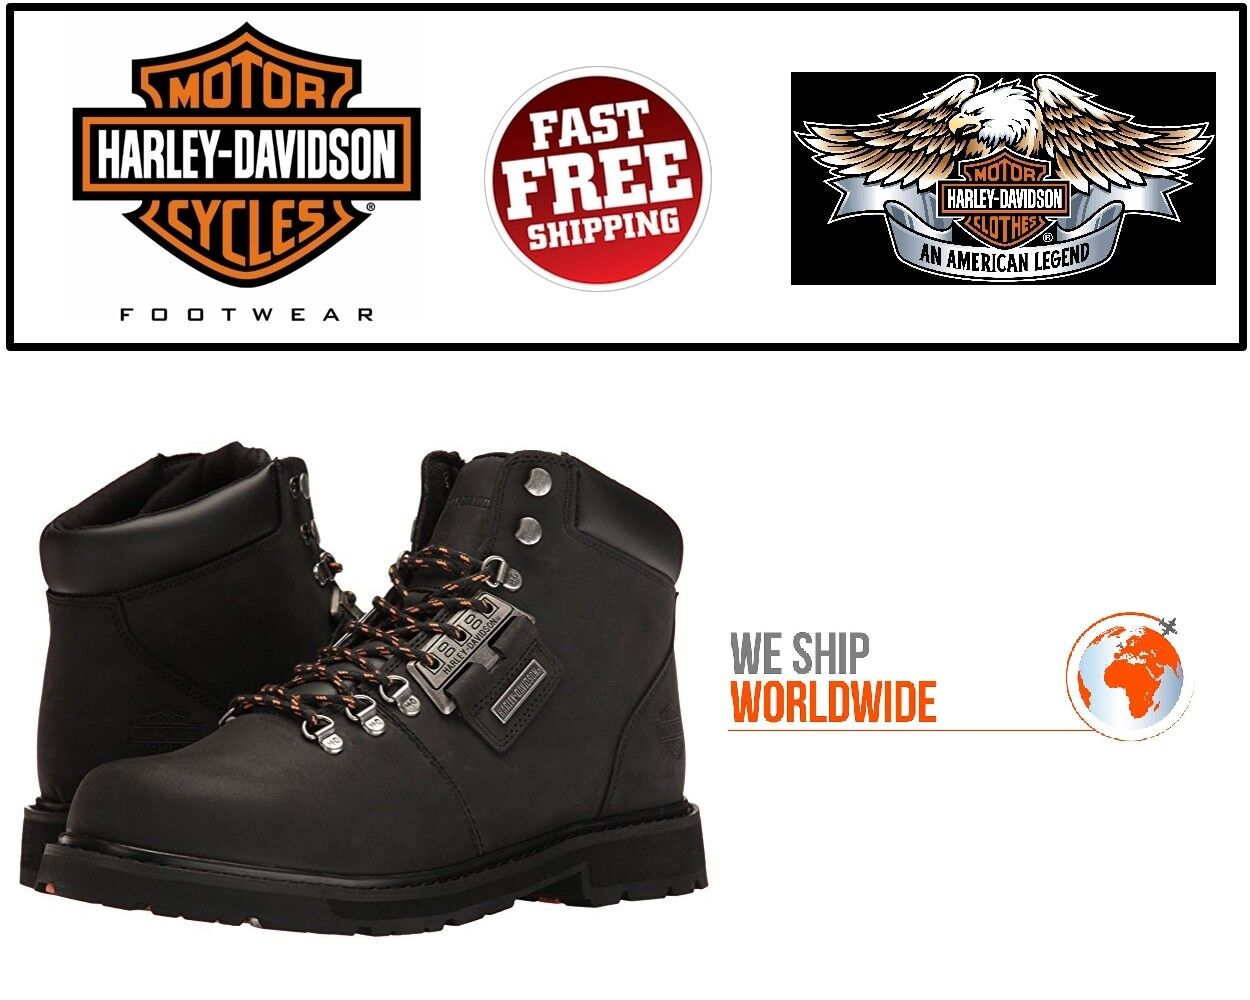 Harley Davidson D93434 Templin  Men's Black Grain Leather Motorcycle Boots